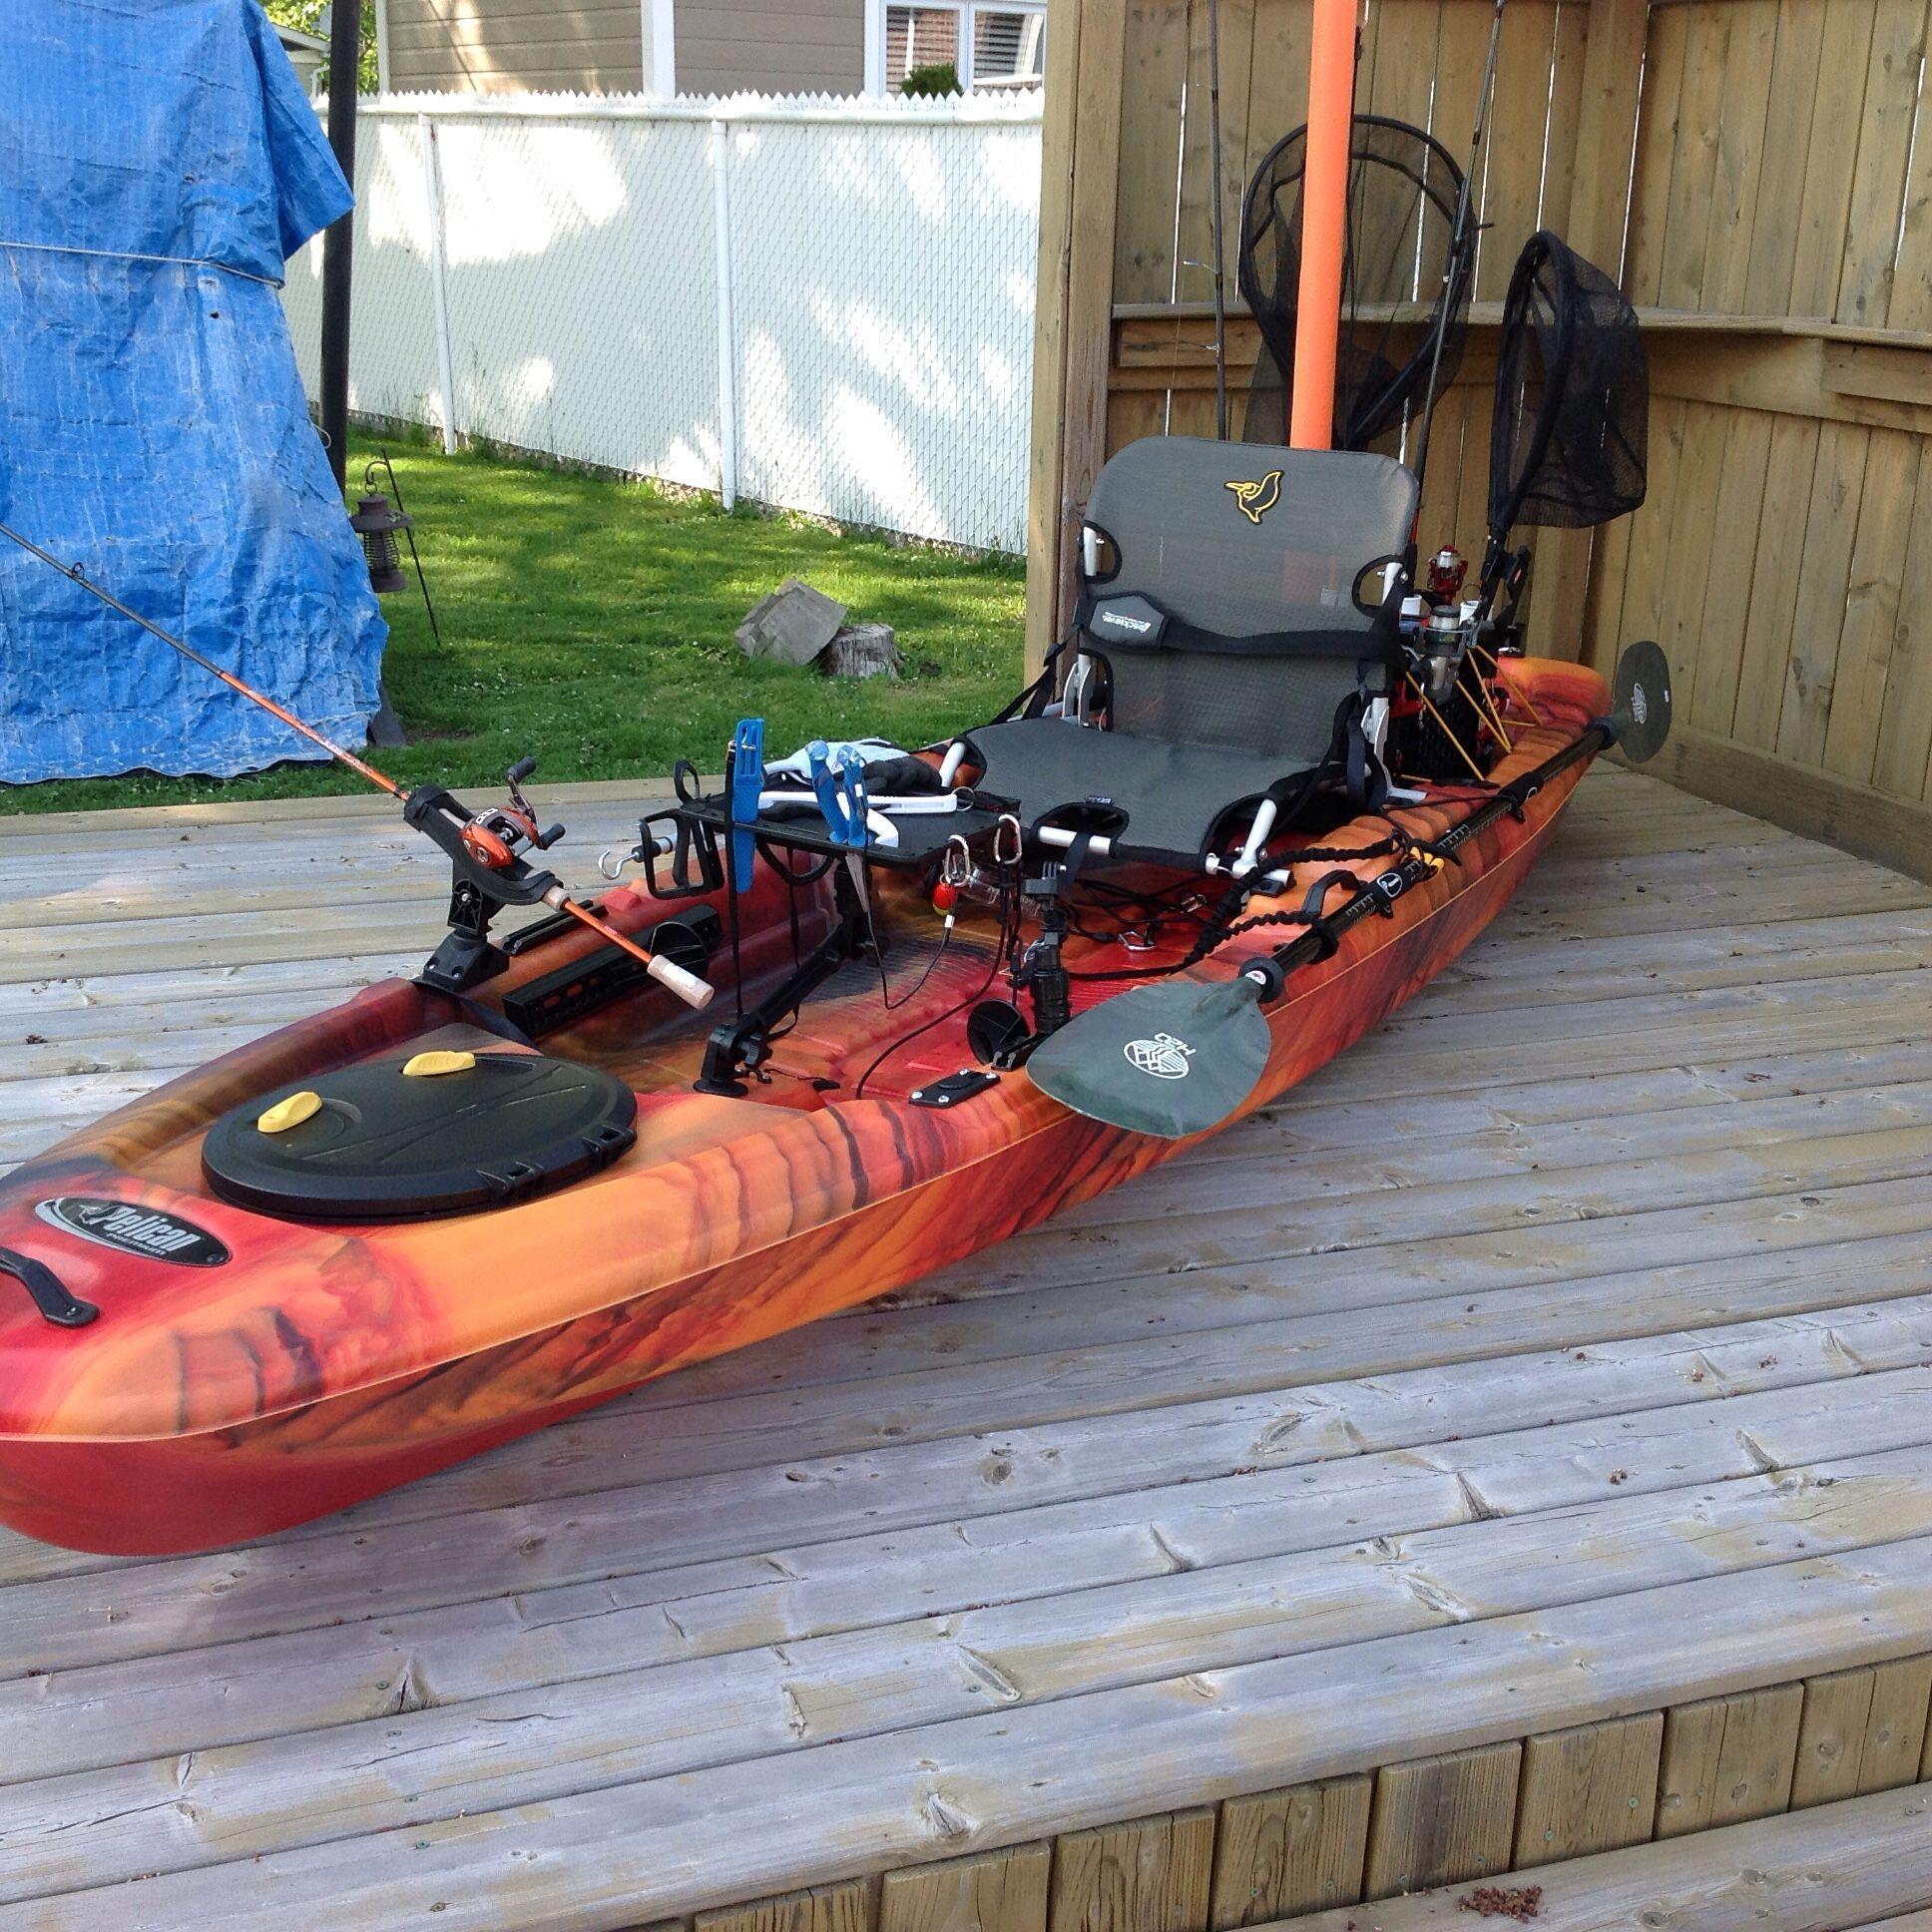 Kayak Catch 120 Modifier With Images Kayak Accessories Angler Kayak Kayaking